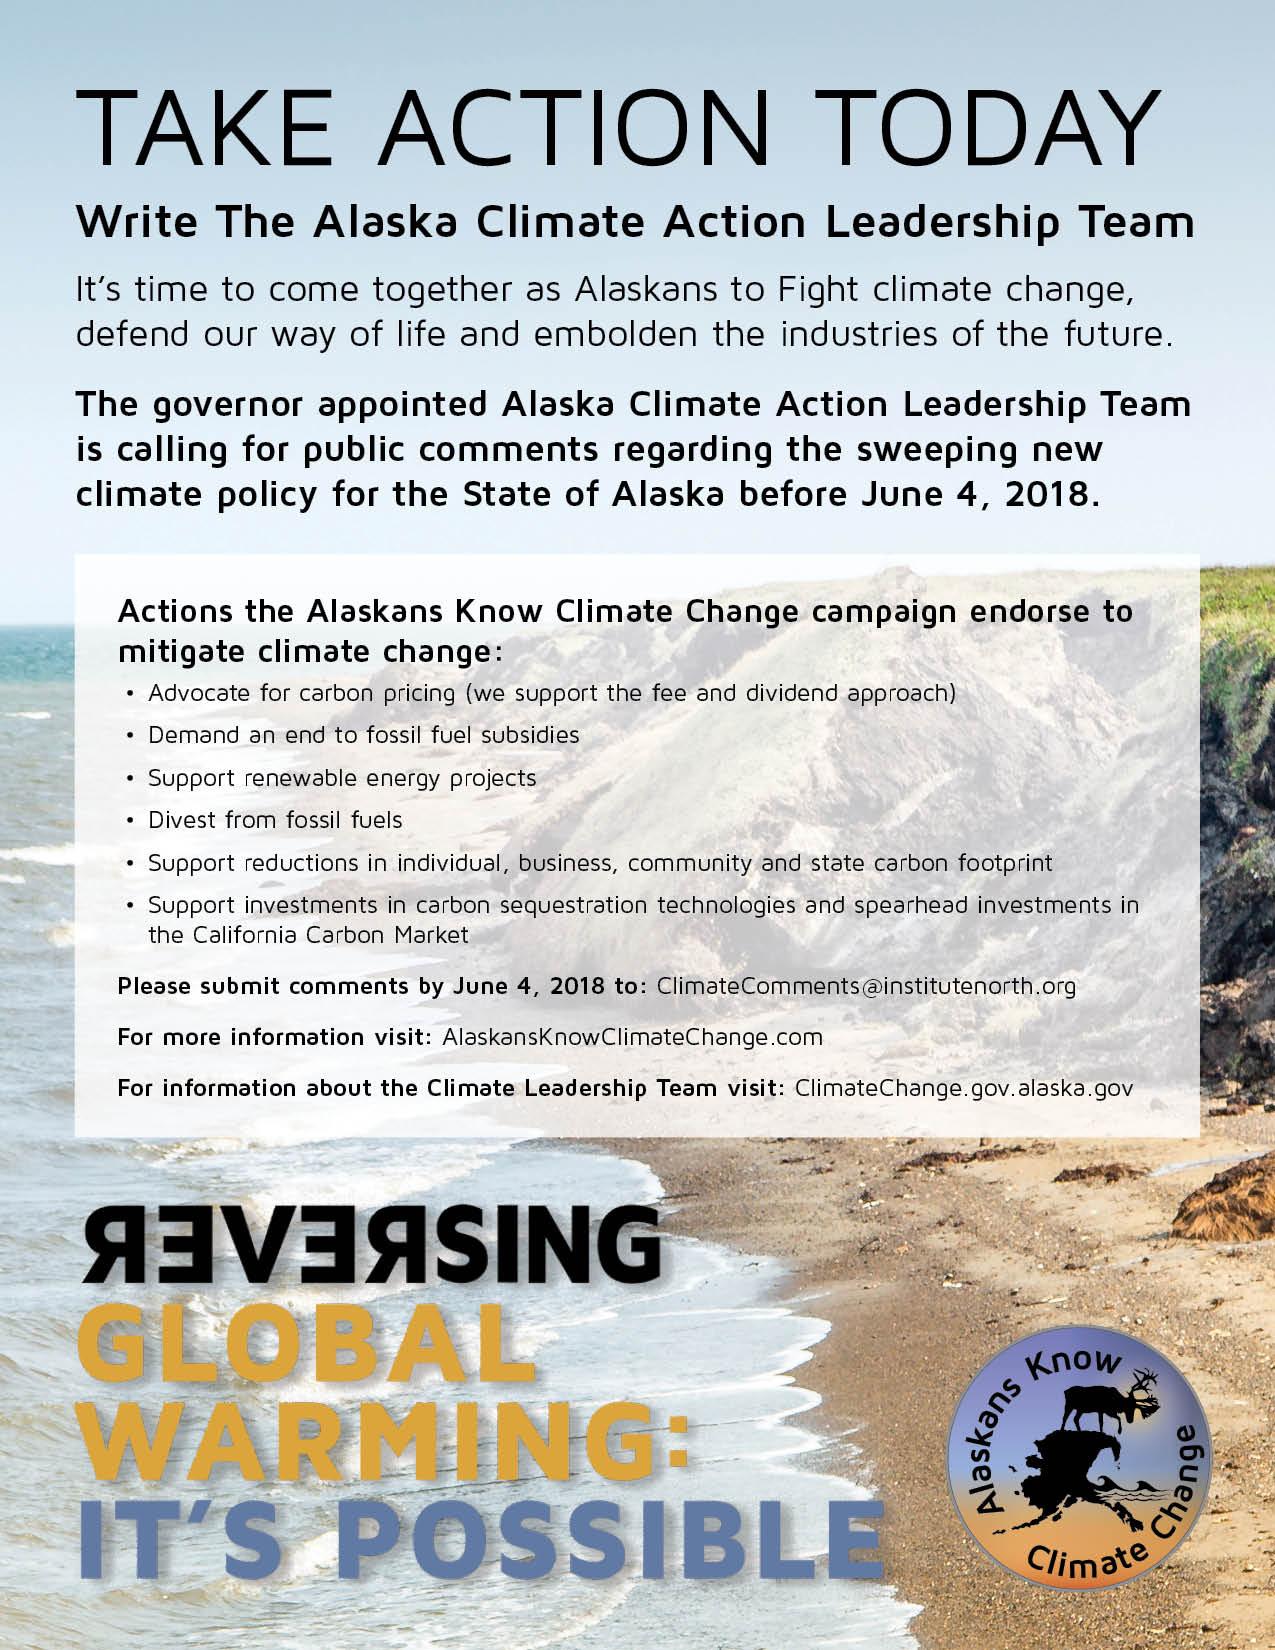 Write The Alaska Climate Action Leadership Team